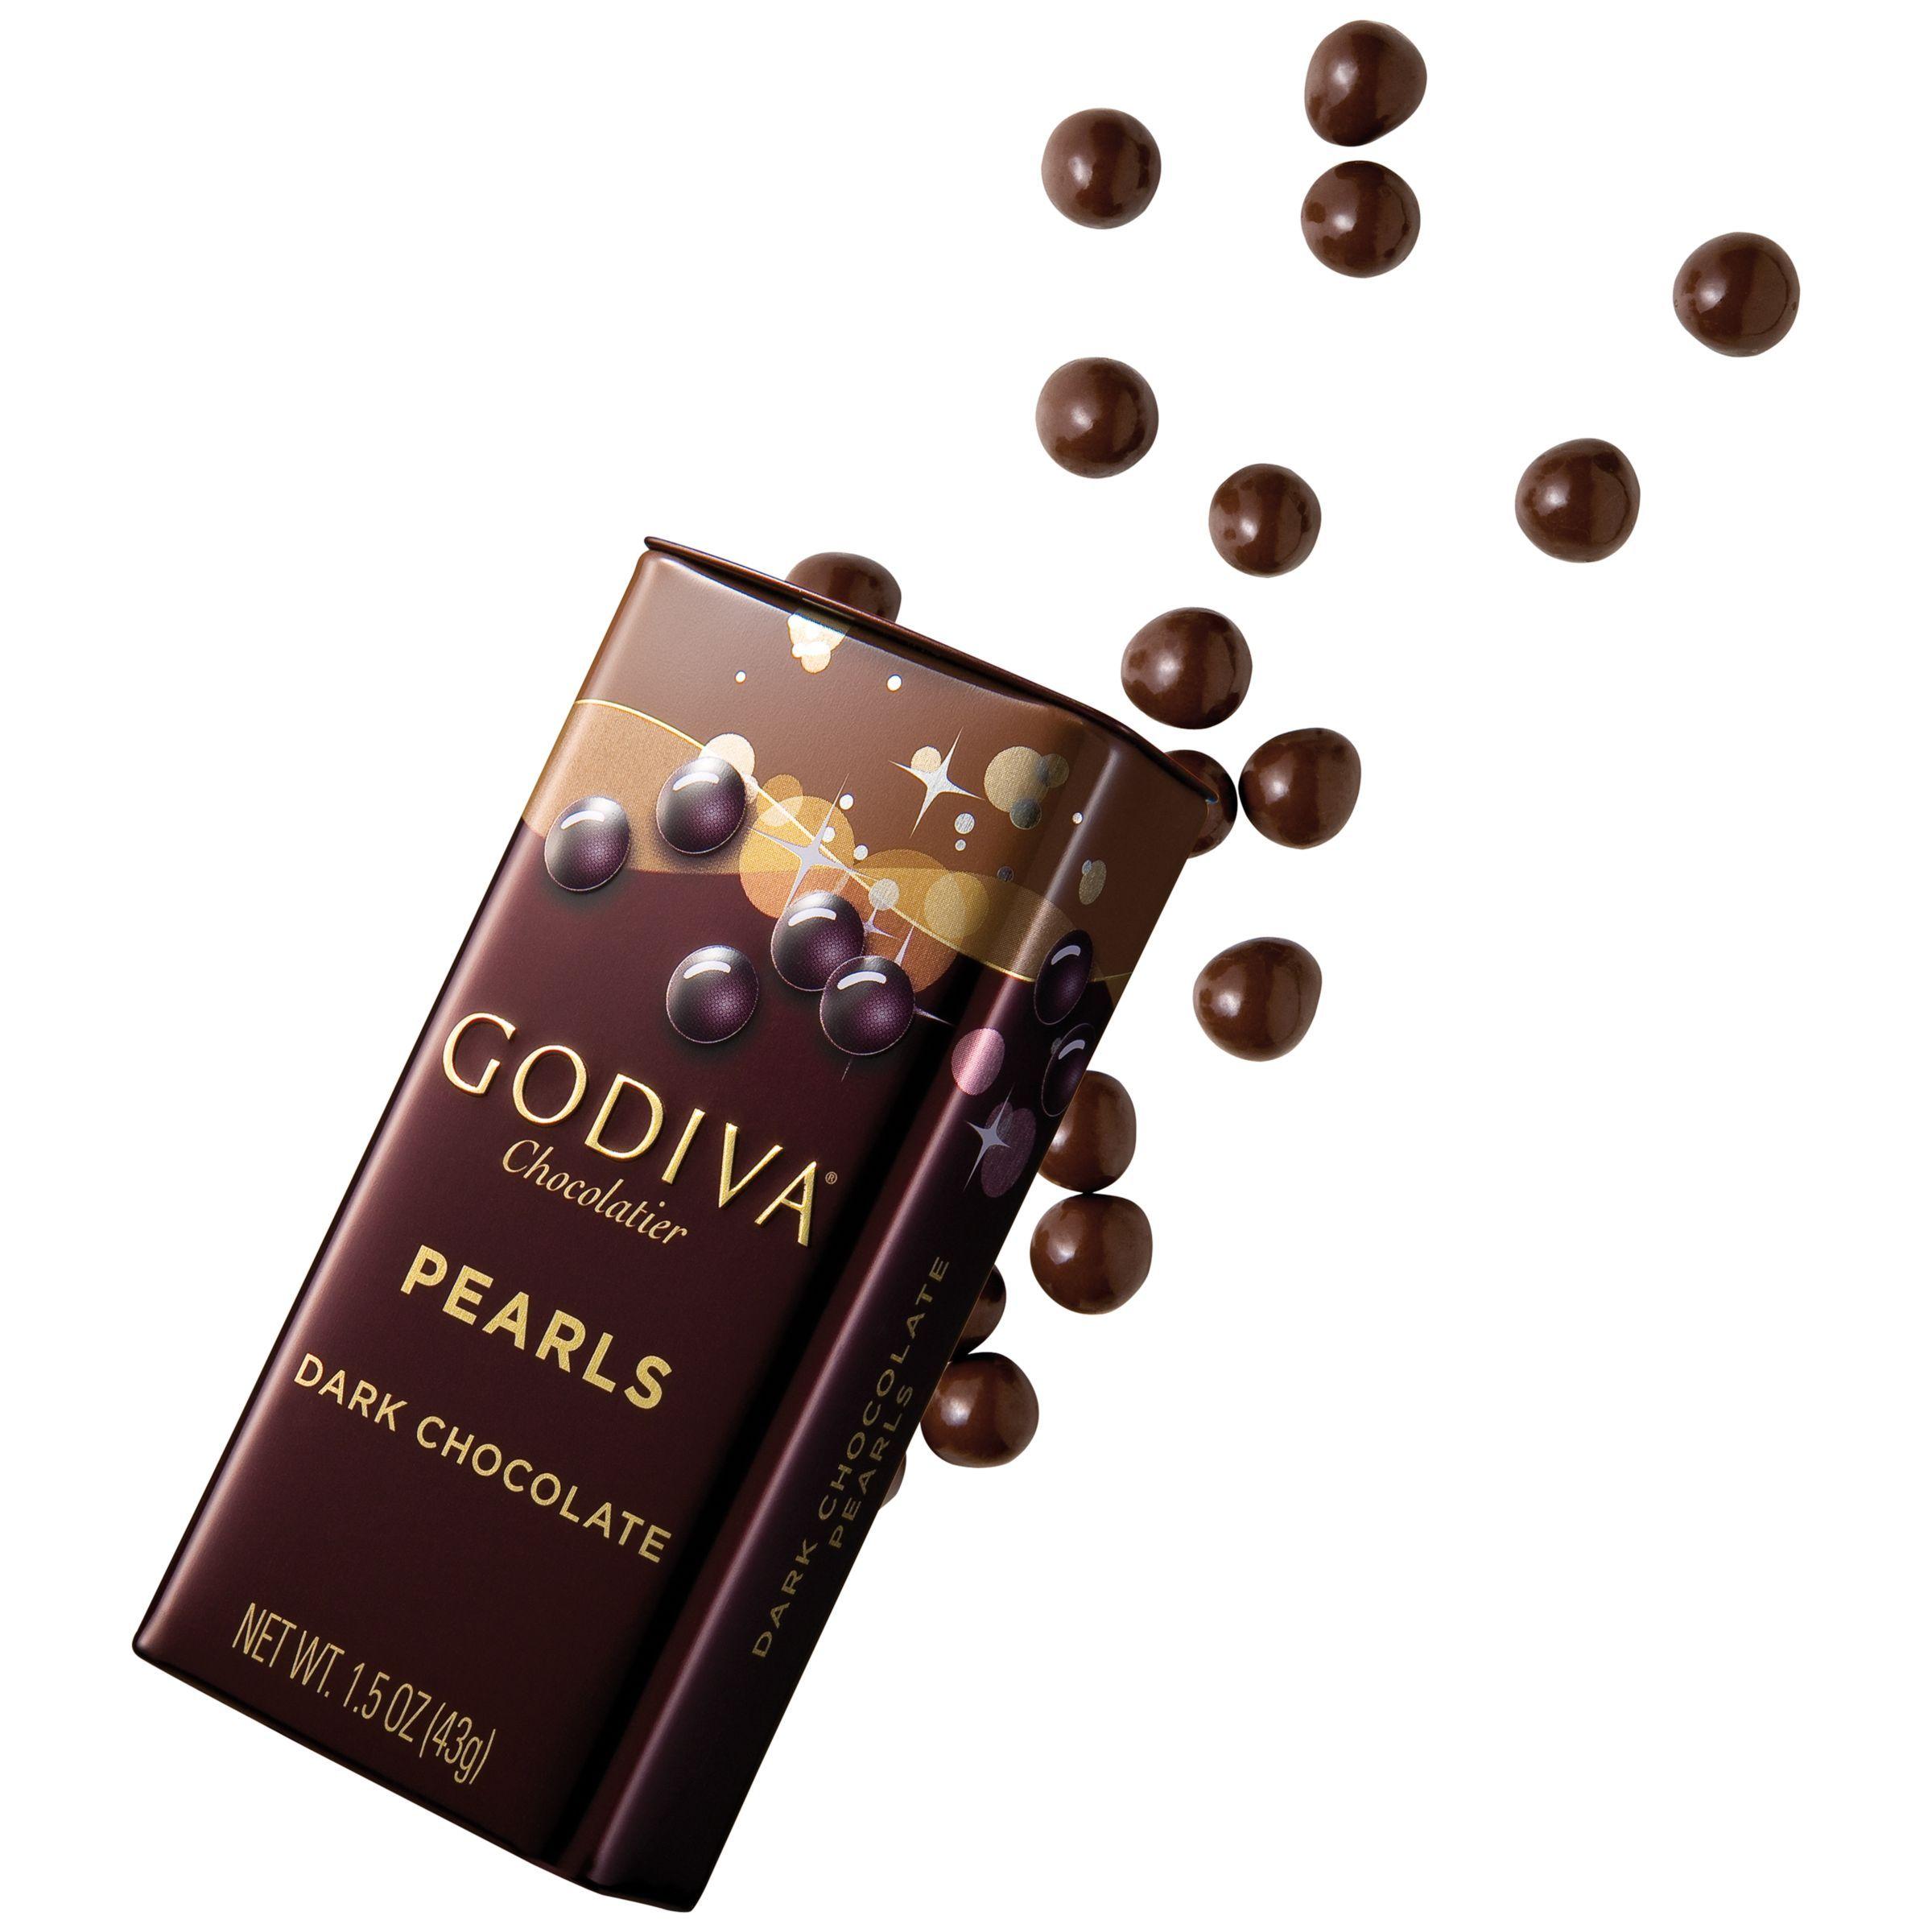 Godiva dark chocolate pearls in a tin 43g chocolate